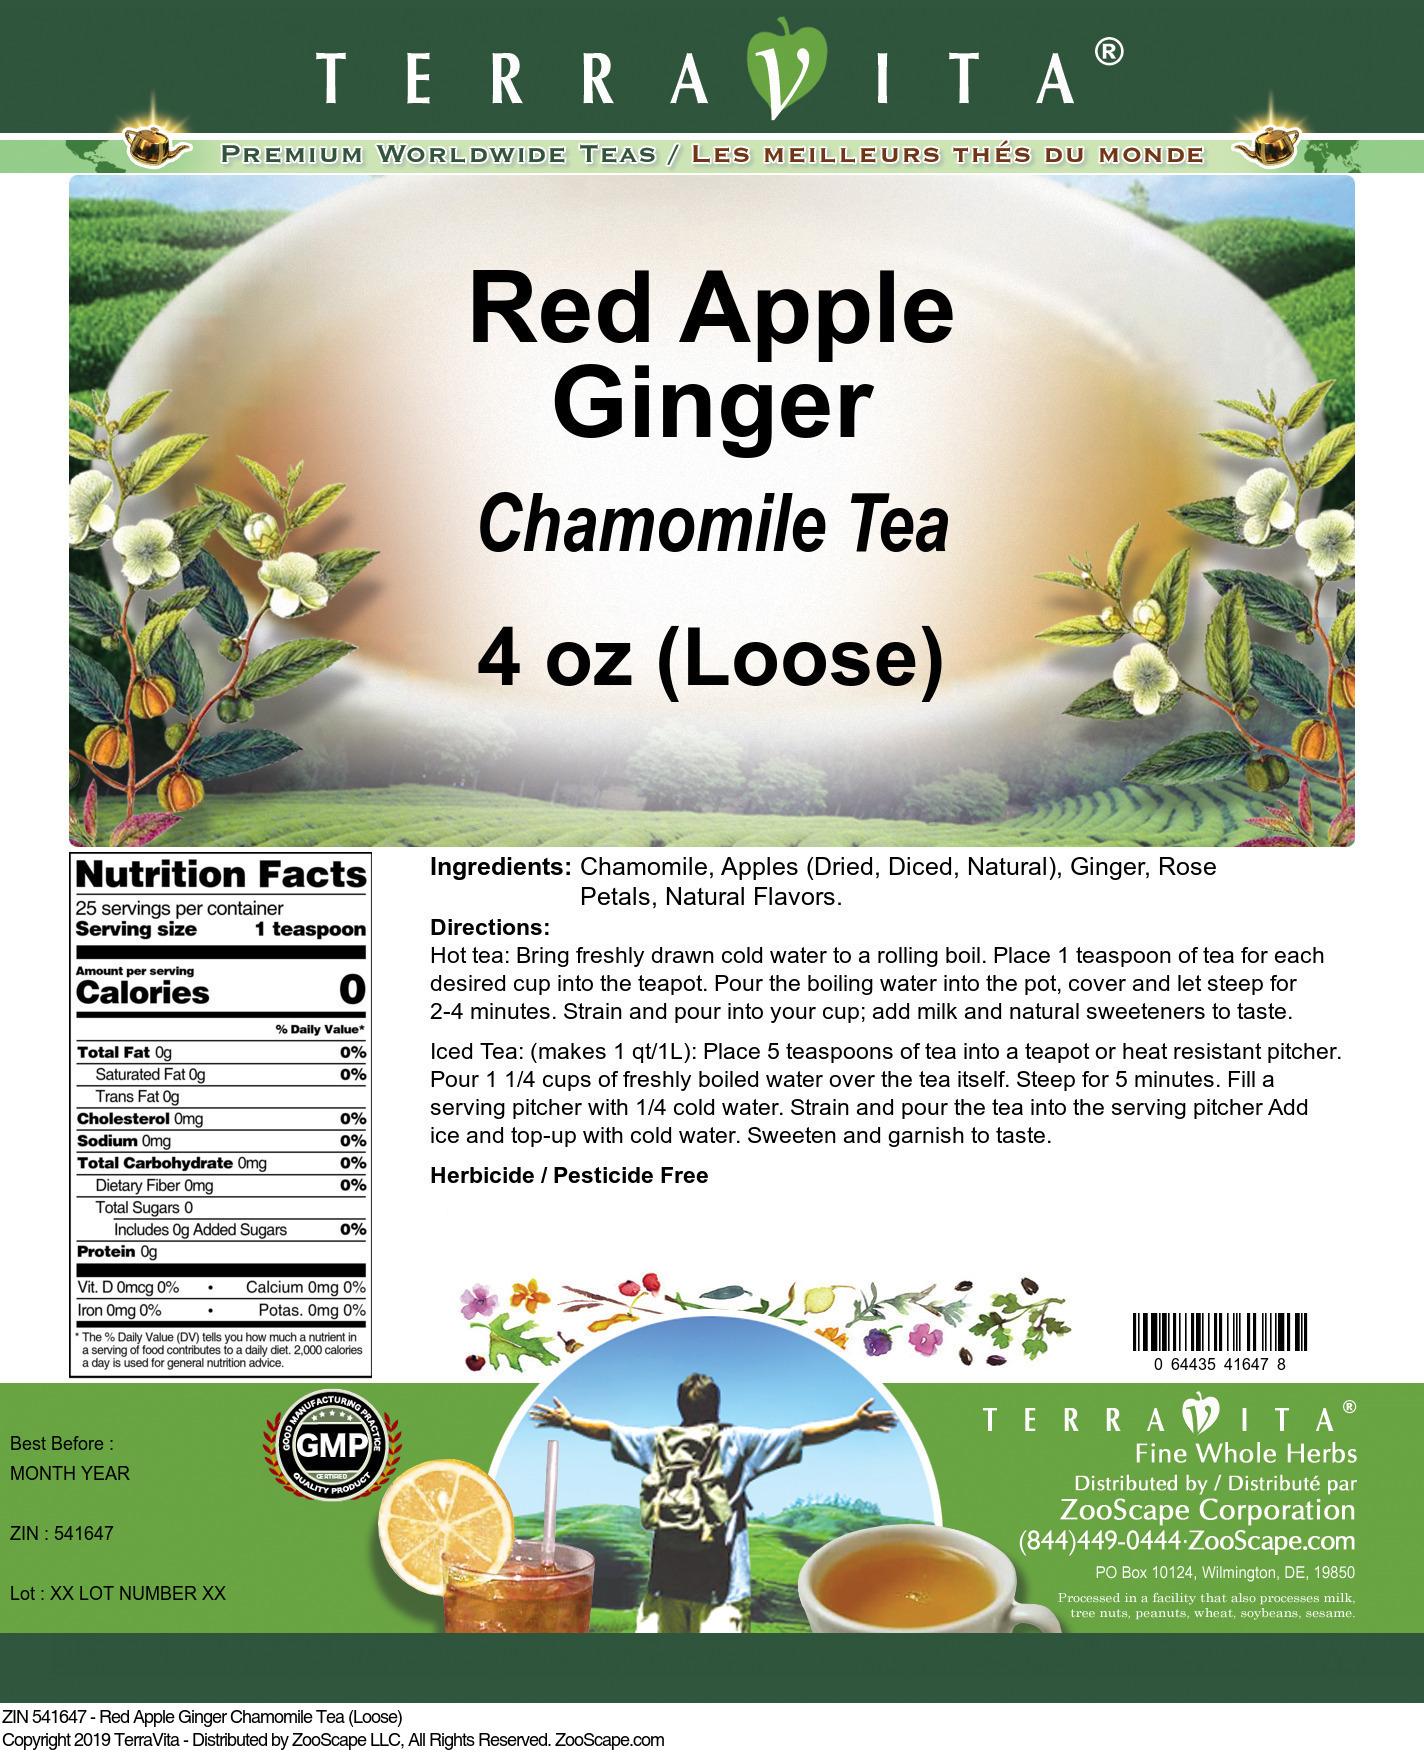 Red Apple Ginger Chamomile Tea